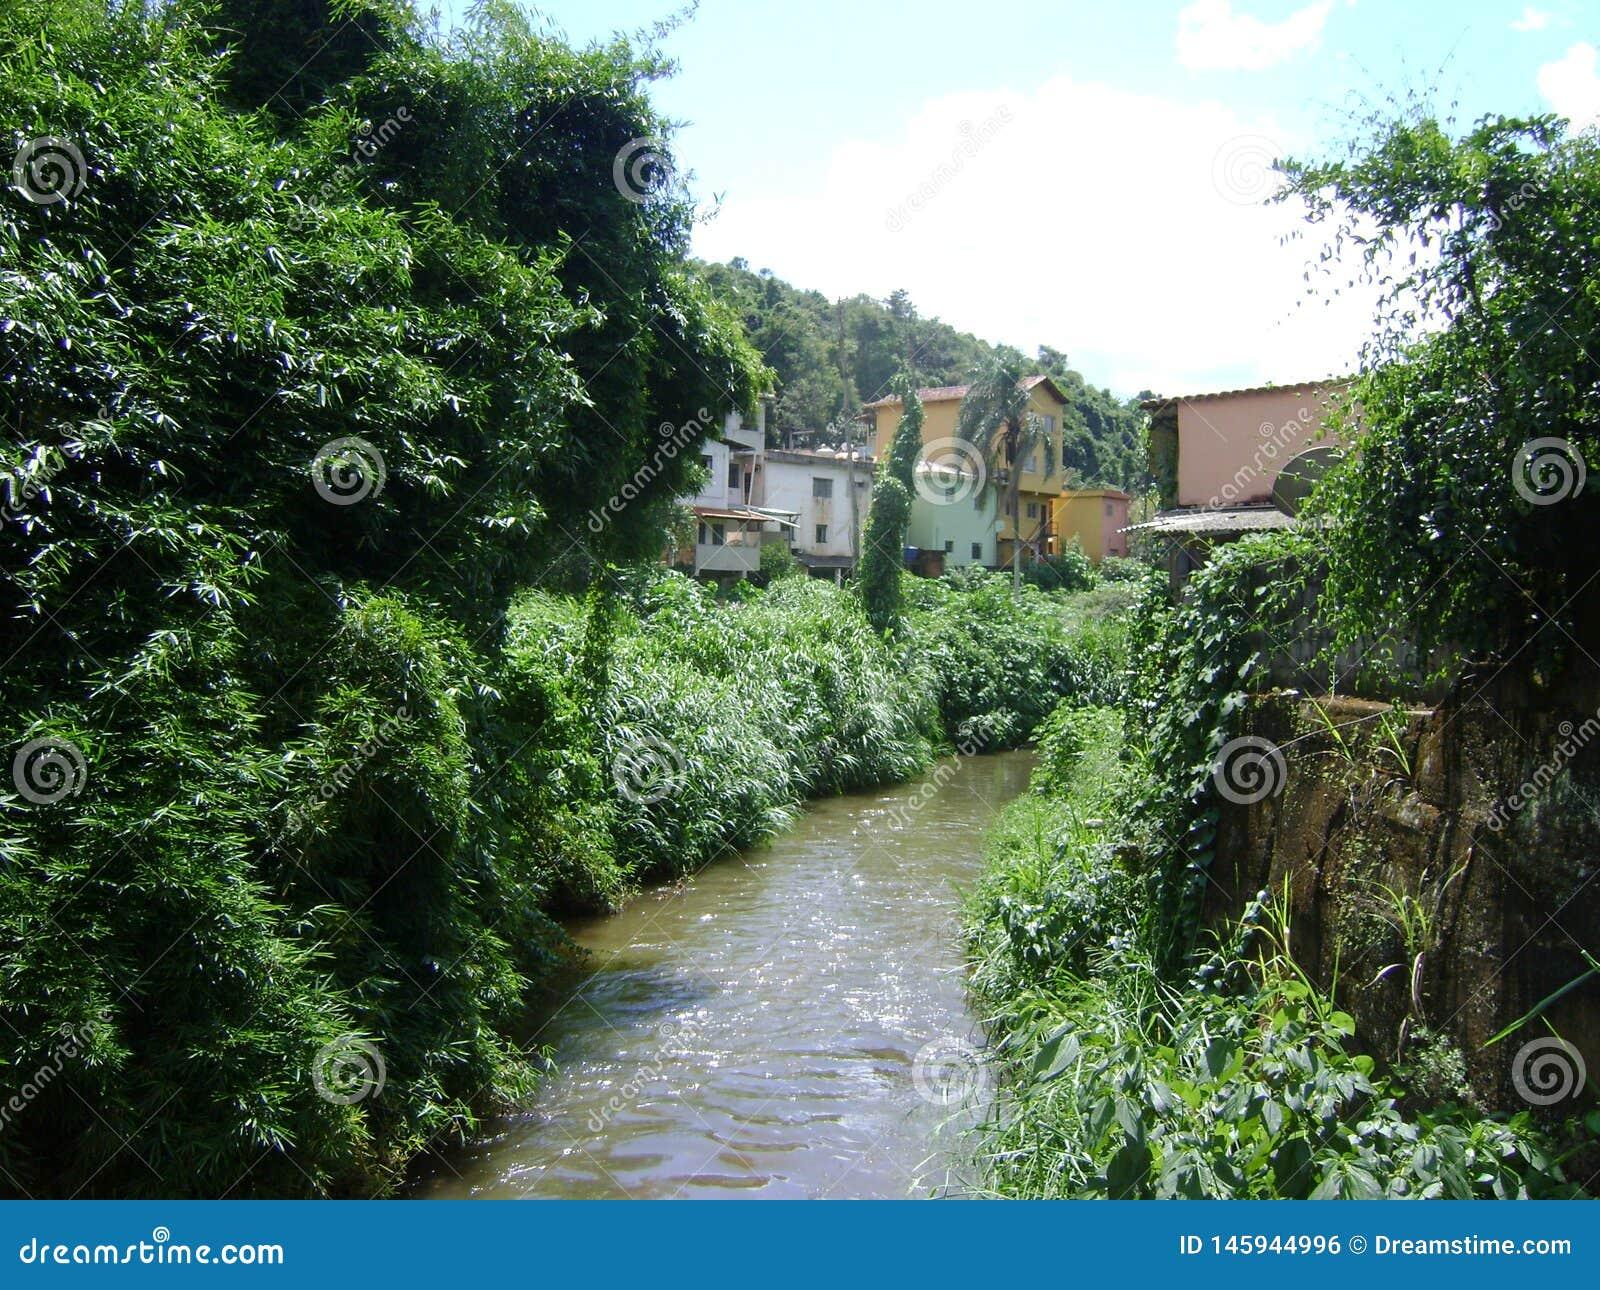 River São João in Barão de Cocais, with polluted water and bamboo plantation on the sides